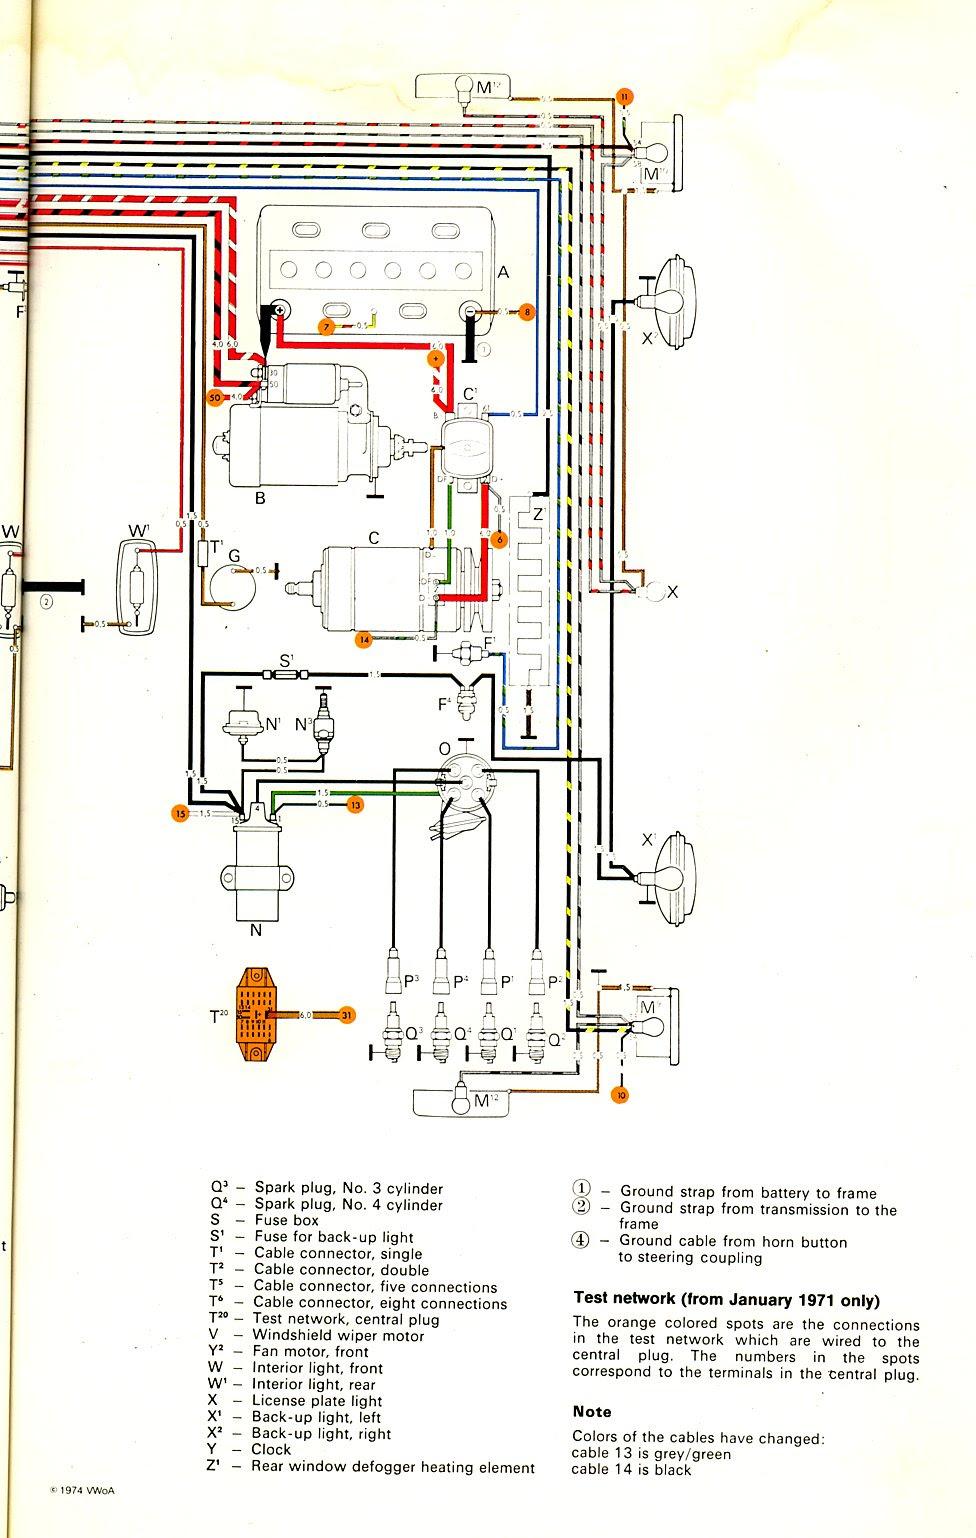 Electric Wiring Diagram 85 Vw Vanagon Wiring Diagram Local B Local B Maceratadoc It